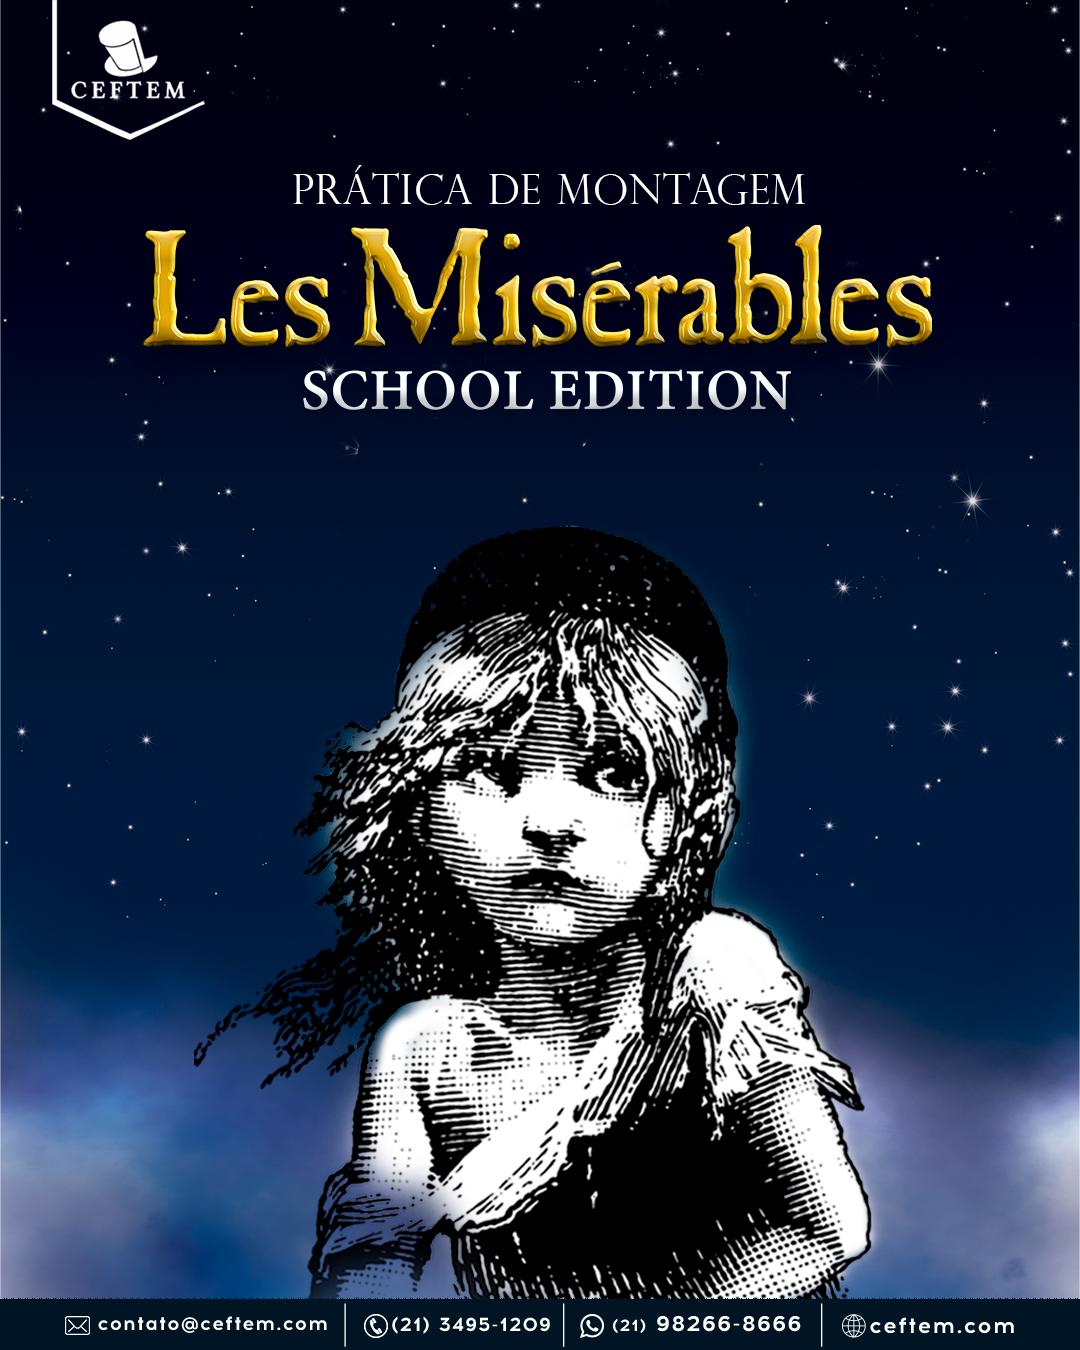 Imagem para Les Miserábles - School Edition